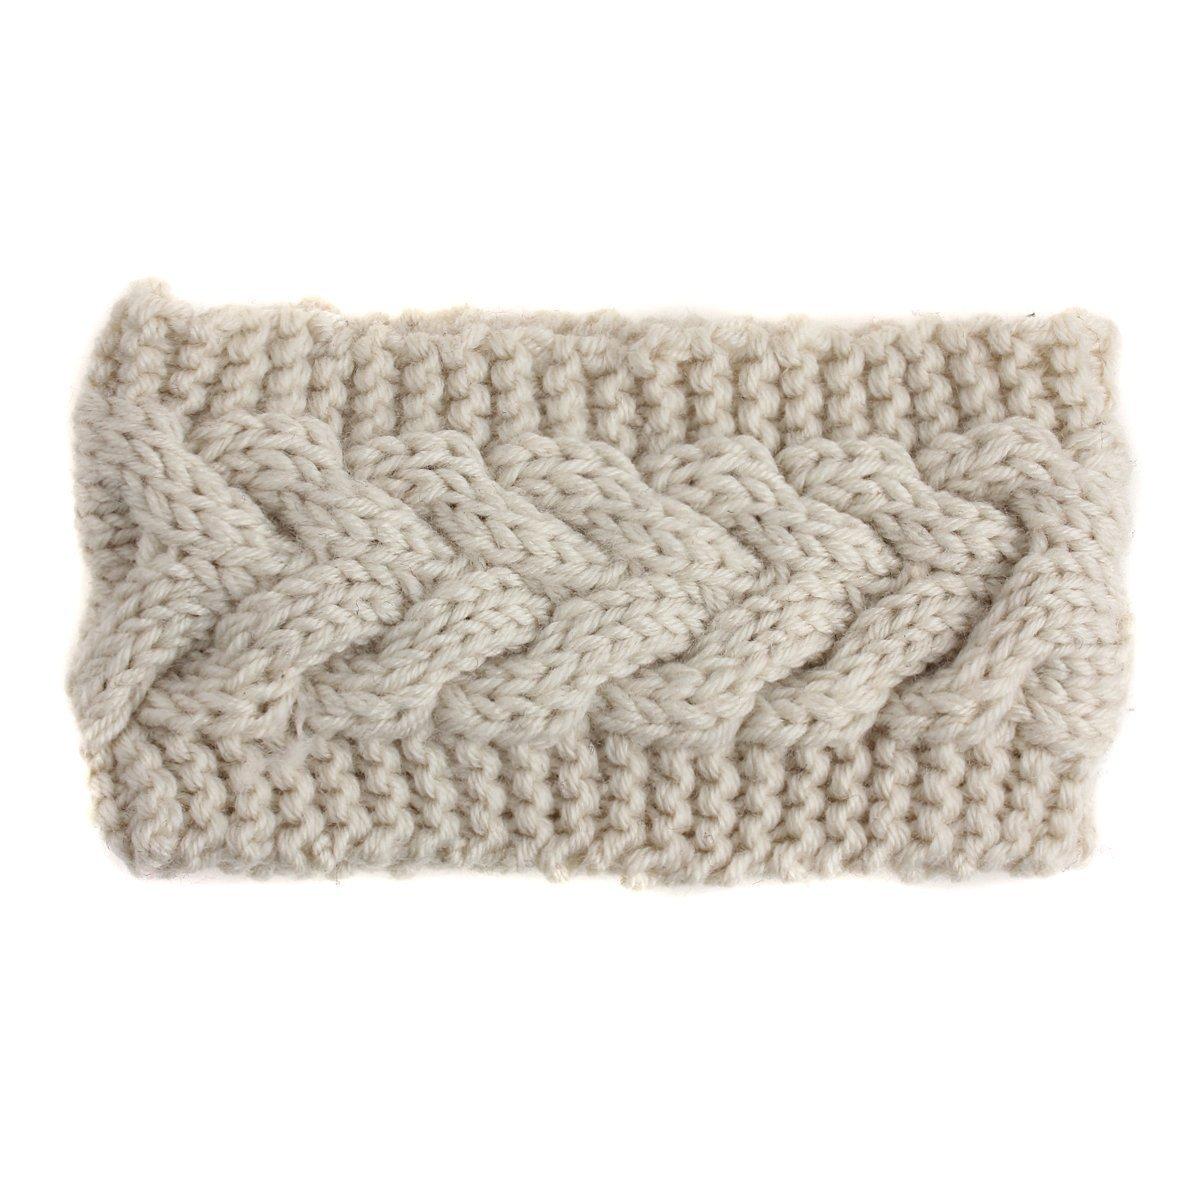 mujeres Twist Crochet punto Cinta tukis puertas Invierno Diadema ...